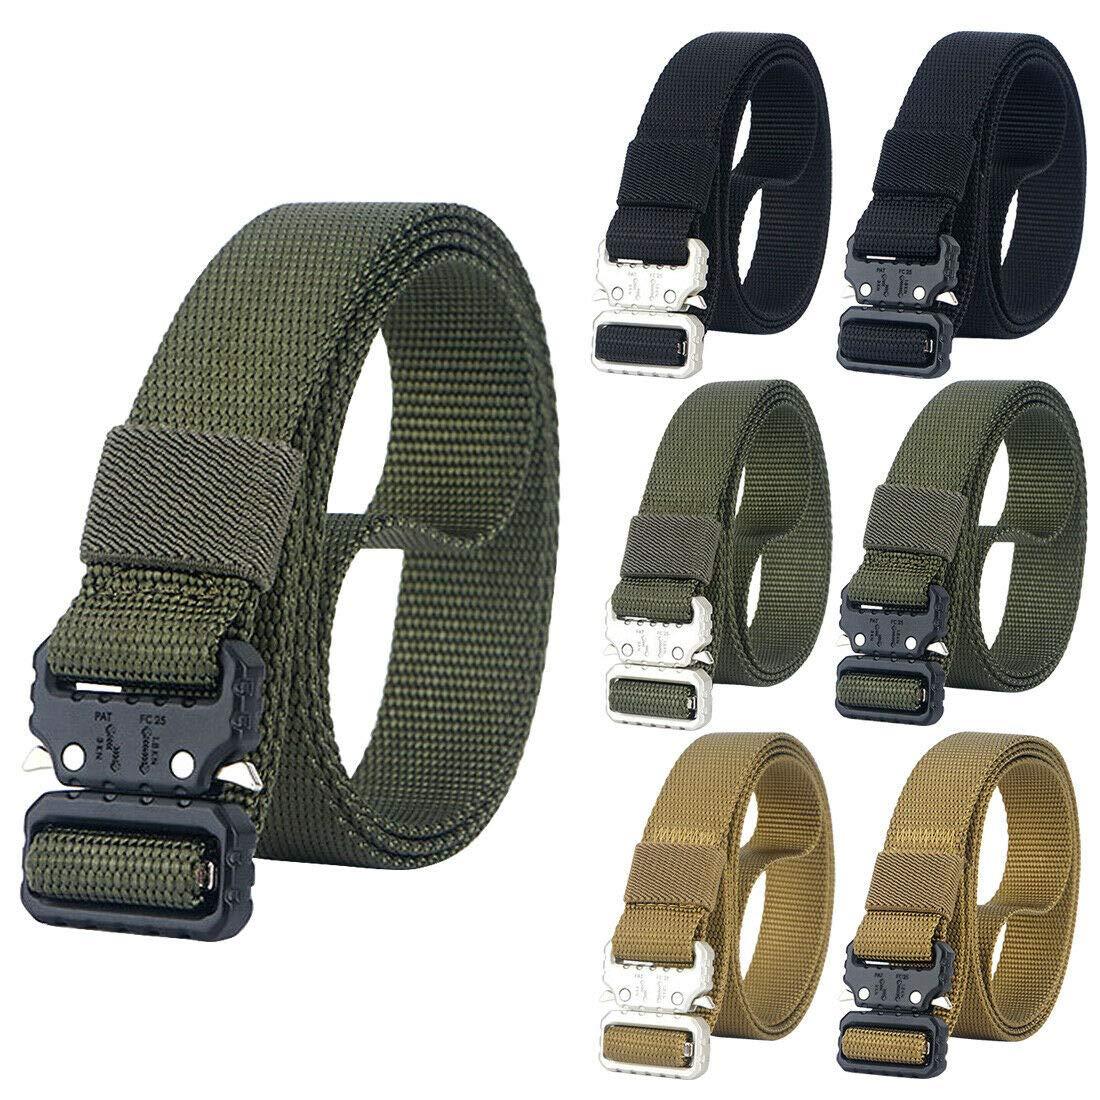 NiceShop16 1 inch Skinny Tactical Belt Military Nylon Webbing Heavy Duty Belts (Army Green (Black Buckle))